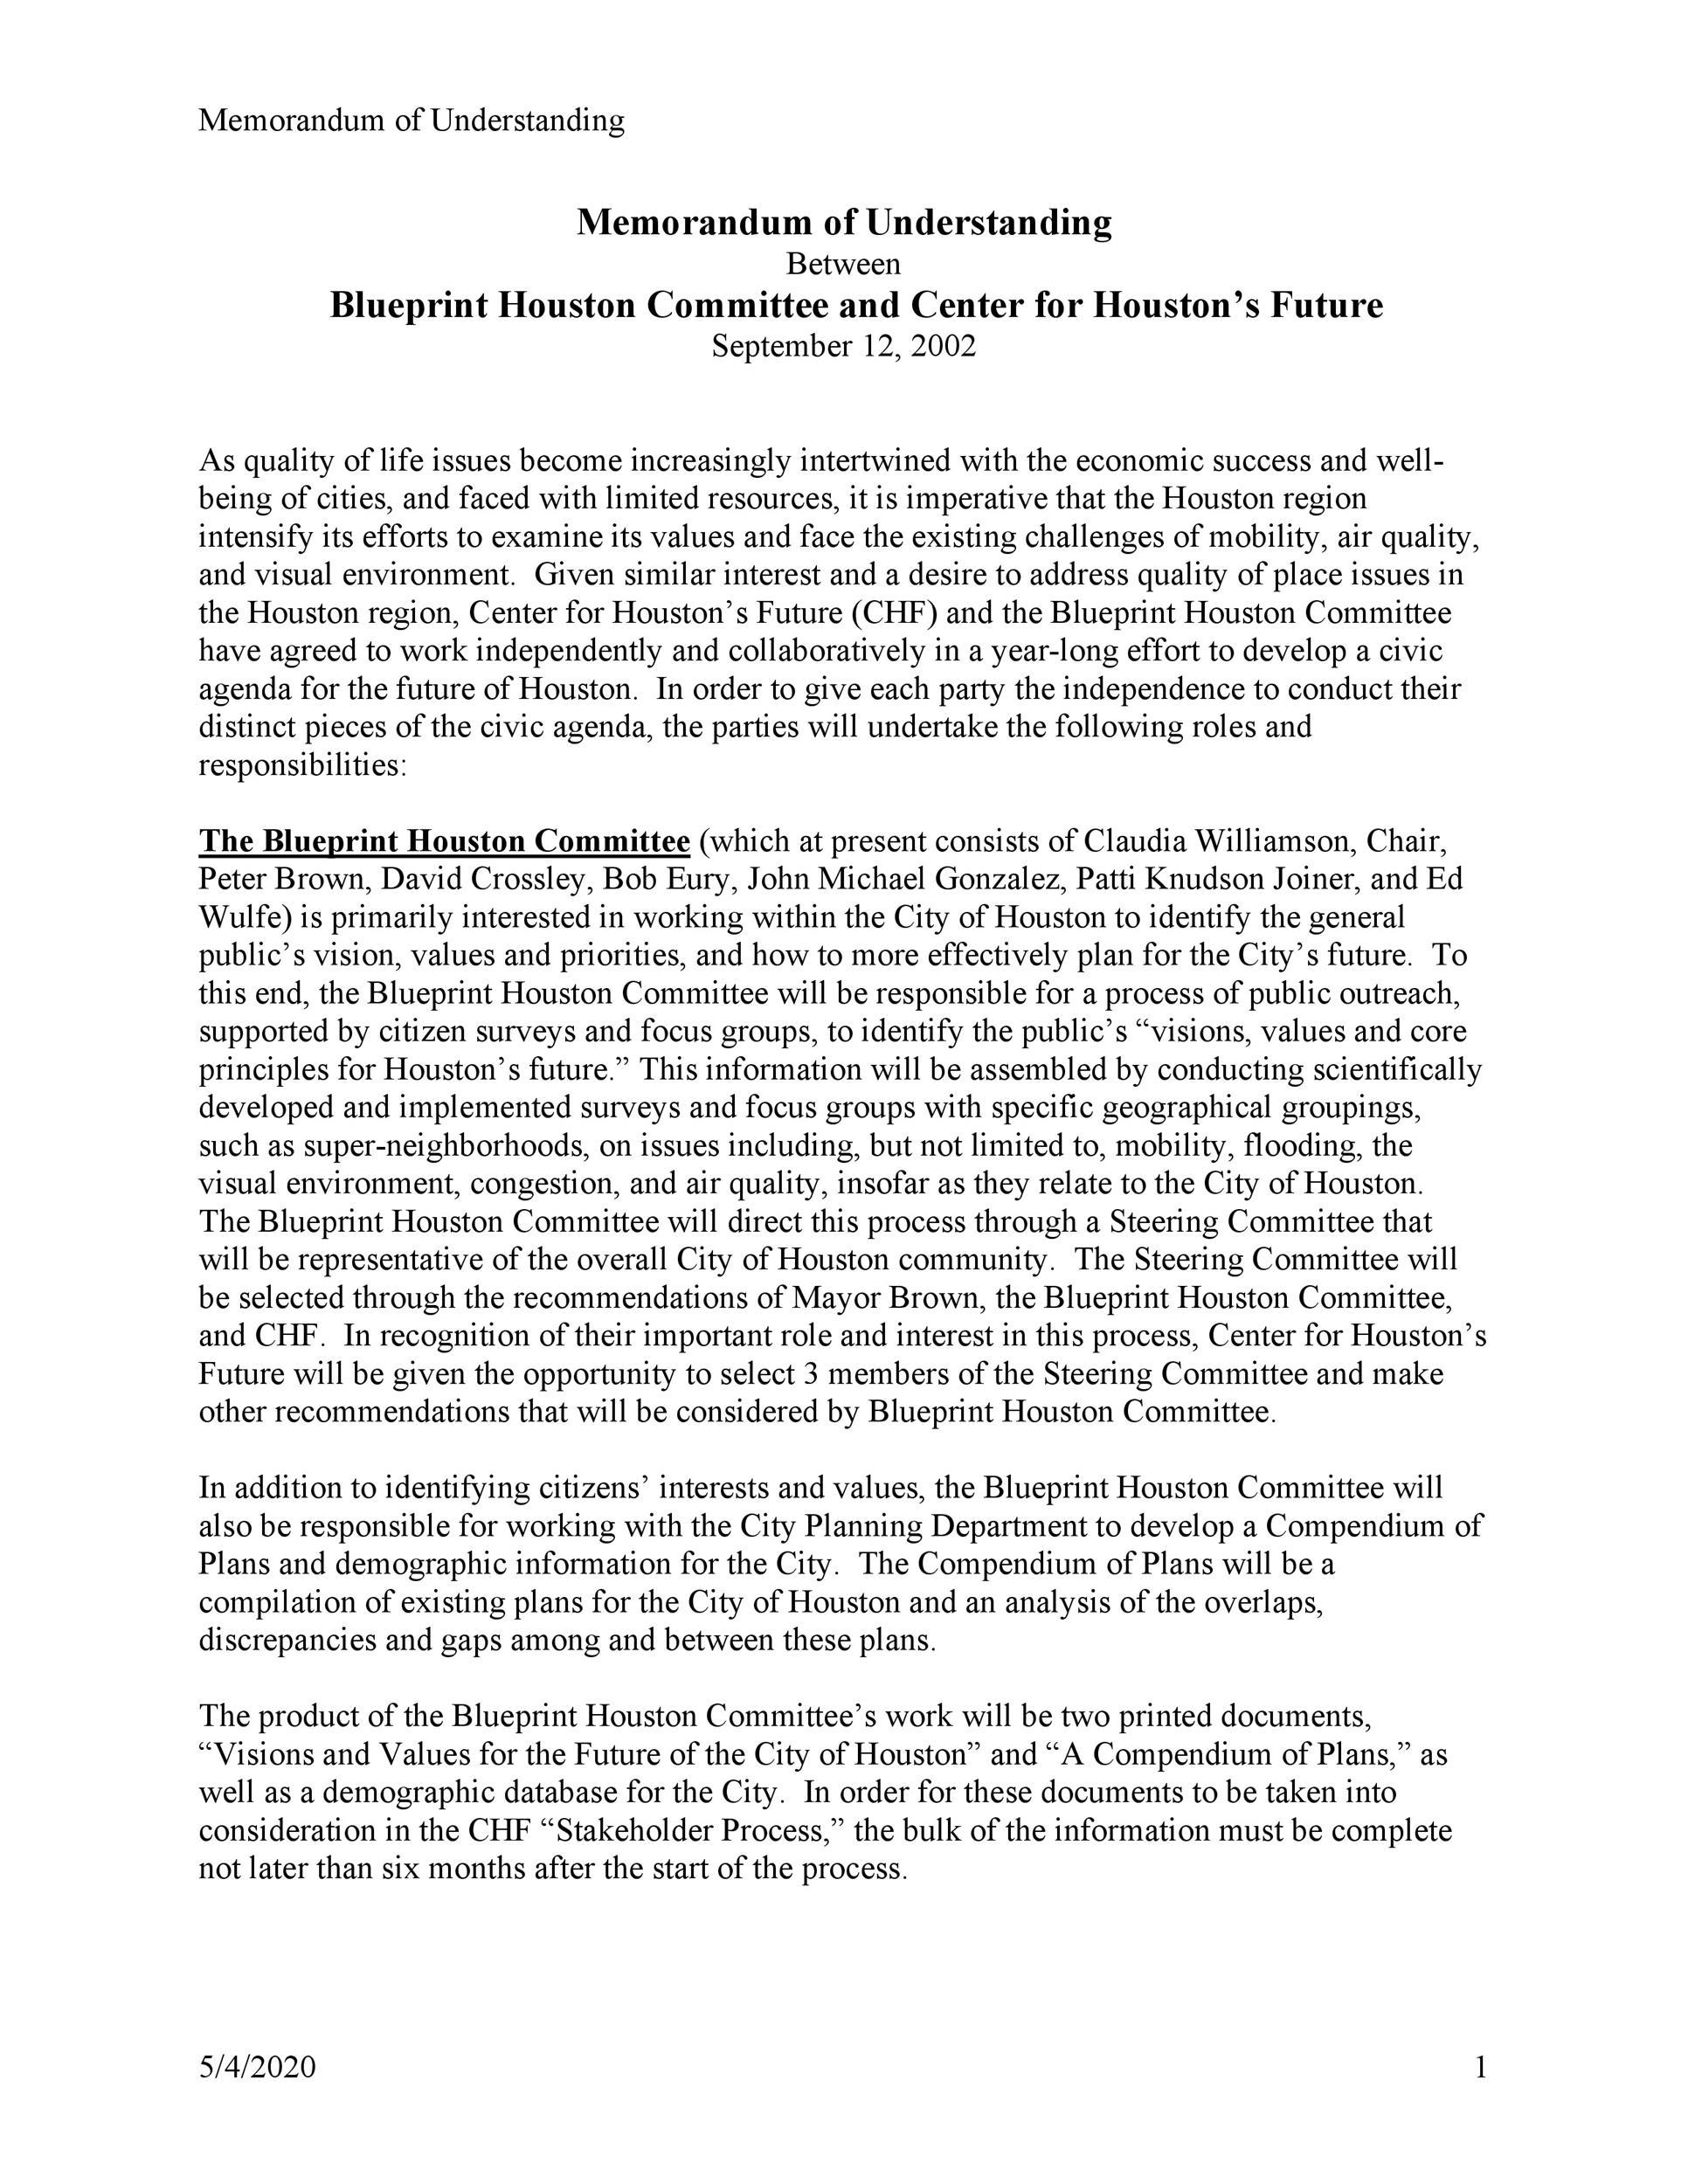 Free Memorandum of Understanding Template 44